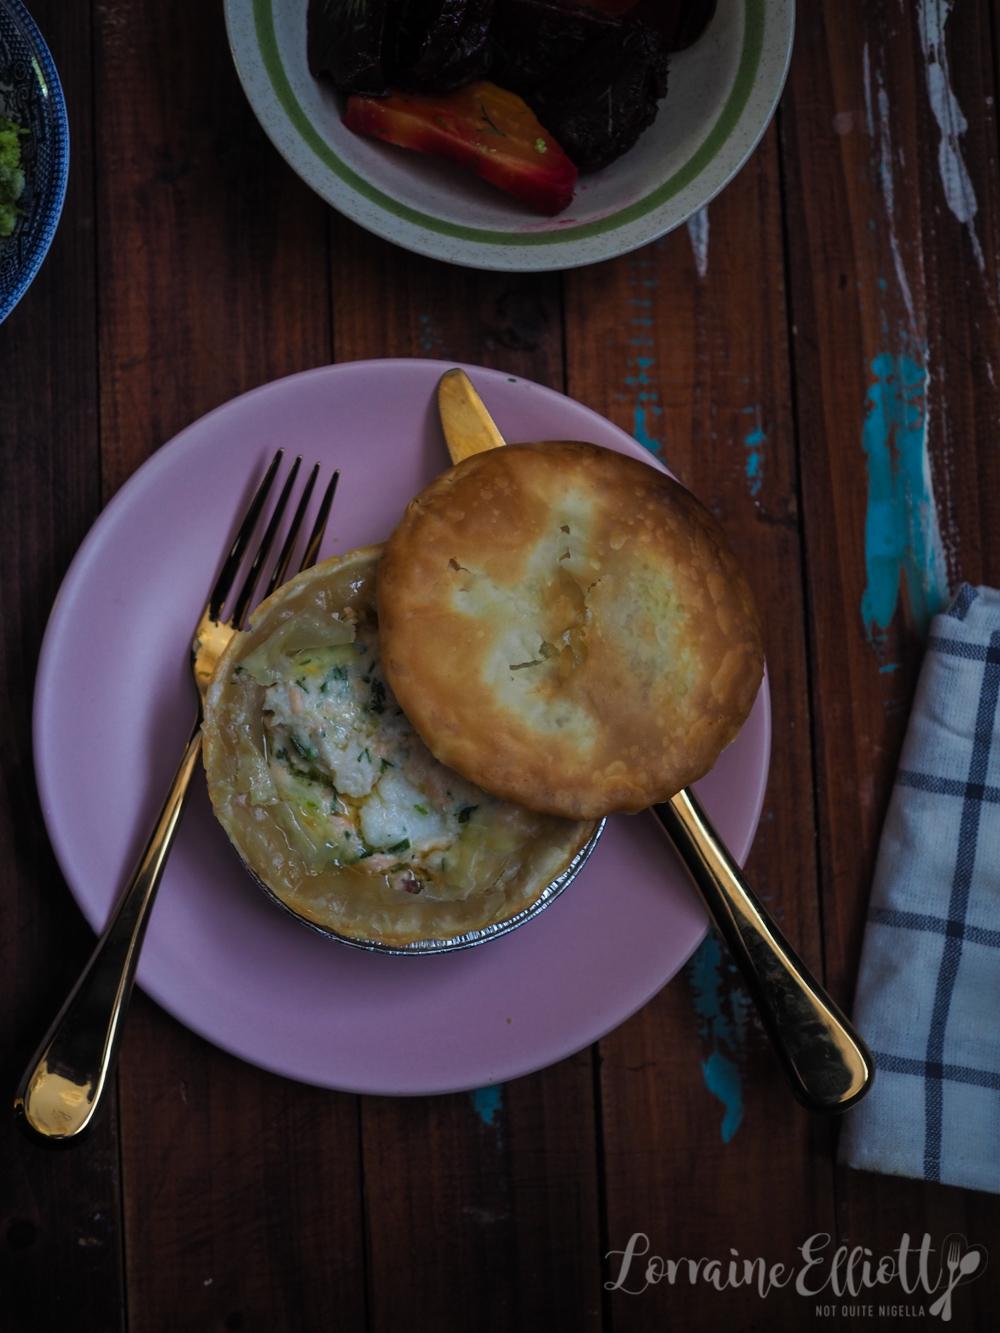 James Wallis's Fish Pie Kits